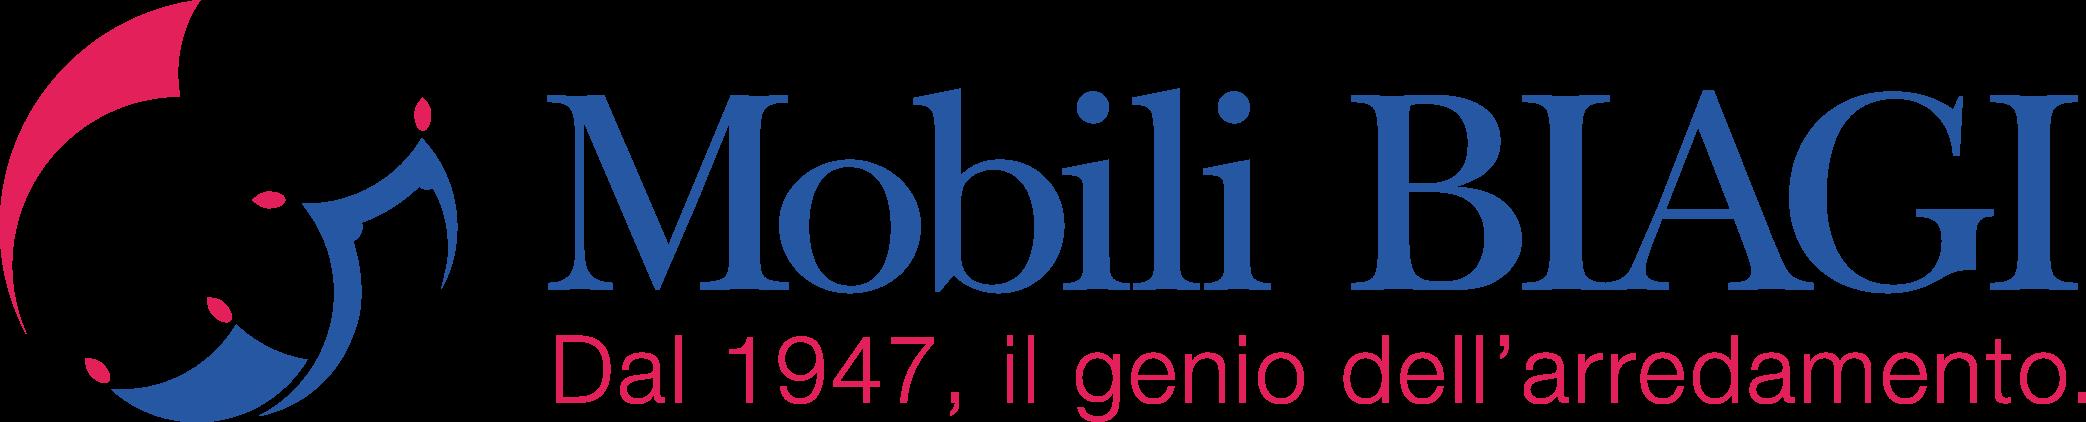 logo_mobilibiagi